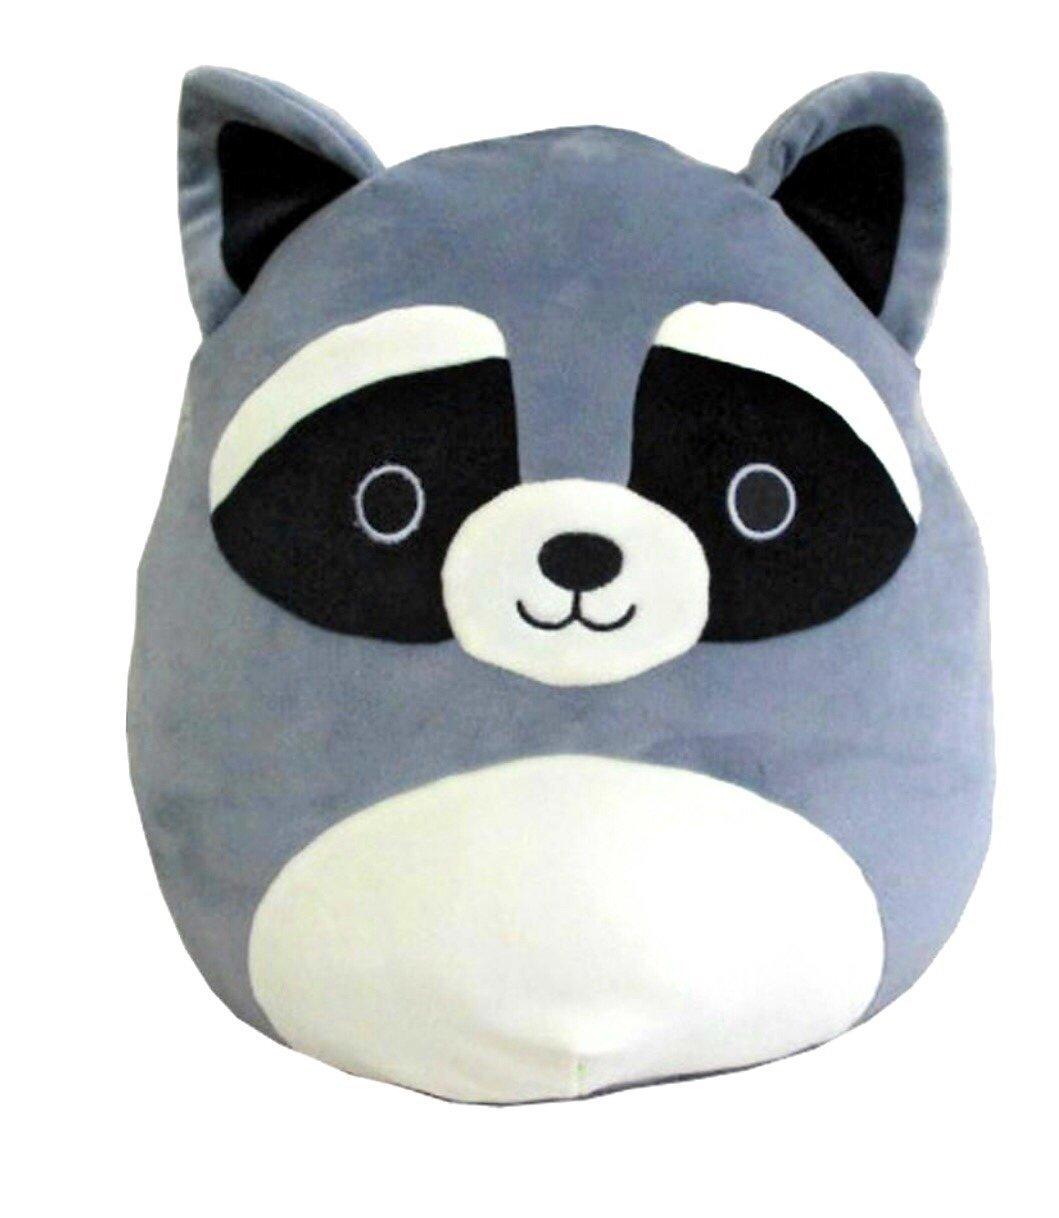 Squishmallows Kellytoy 16'' Raccoon Super Soft Plush Toy Pillow Animal Pet Pal Buddy (Grey Raccoon)